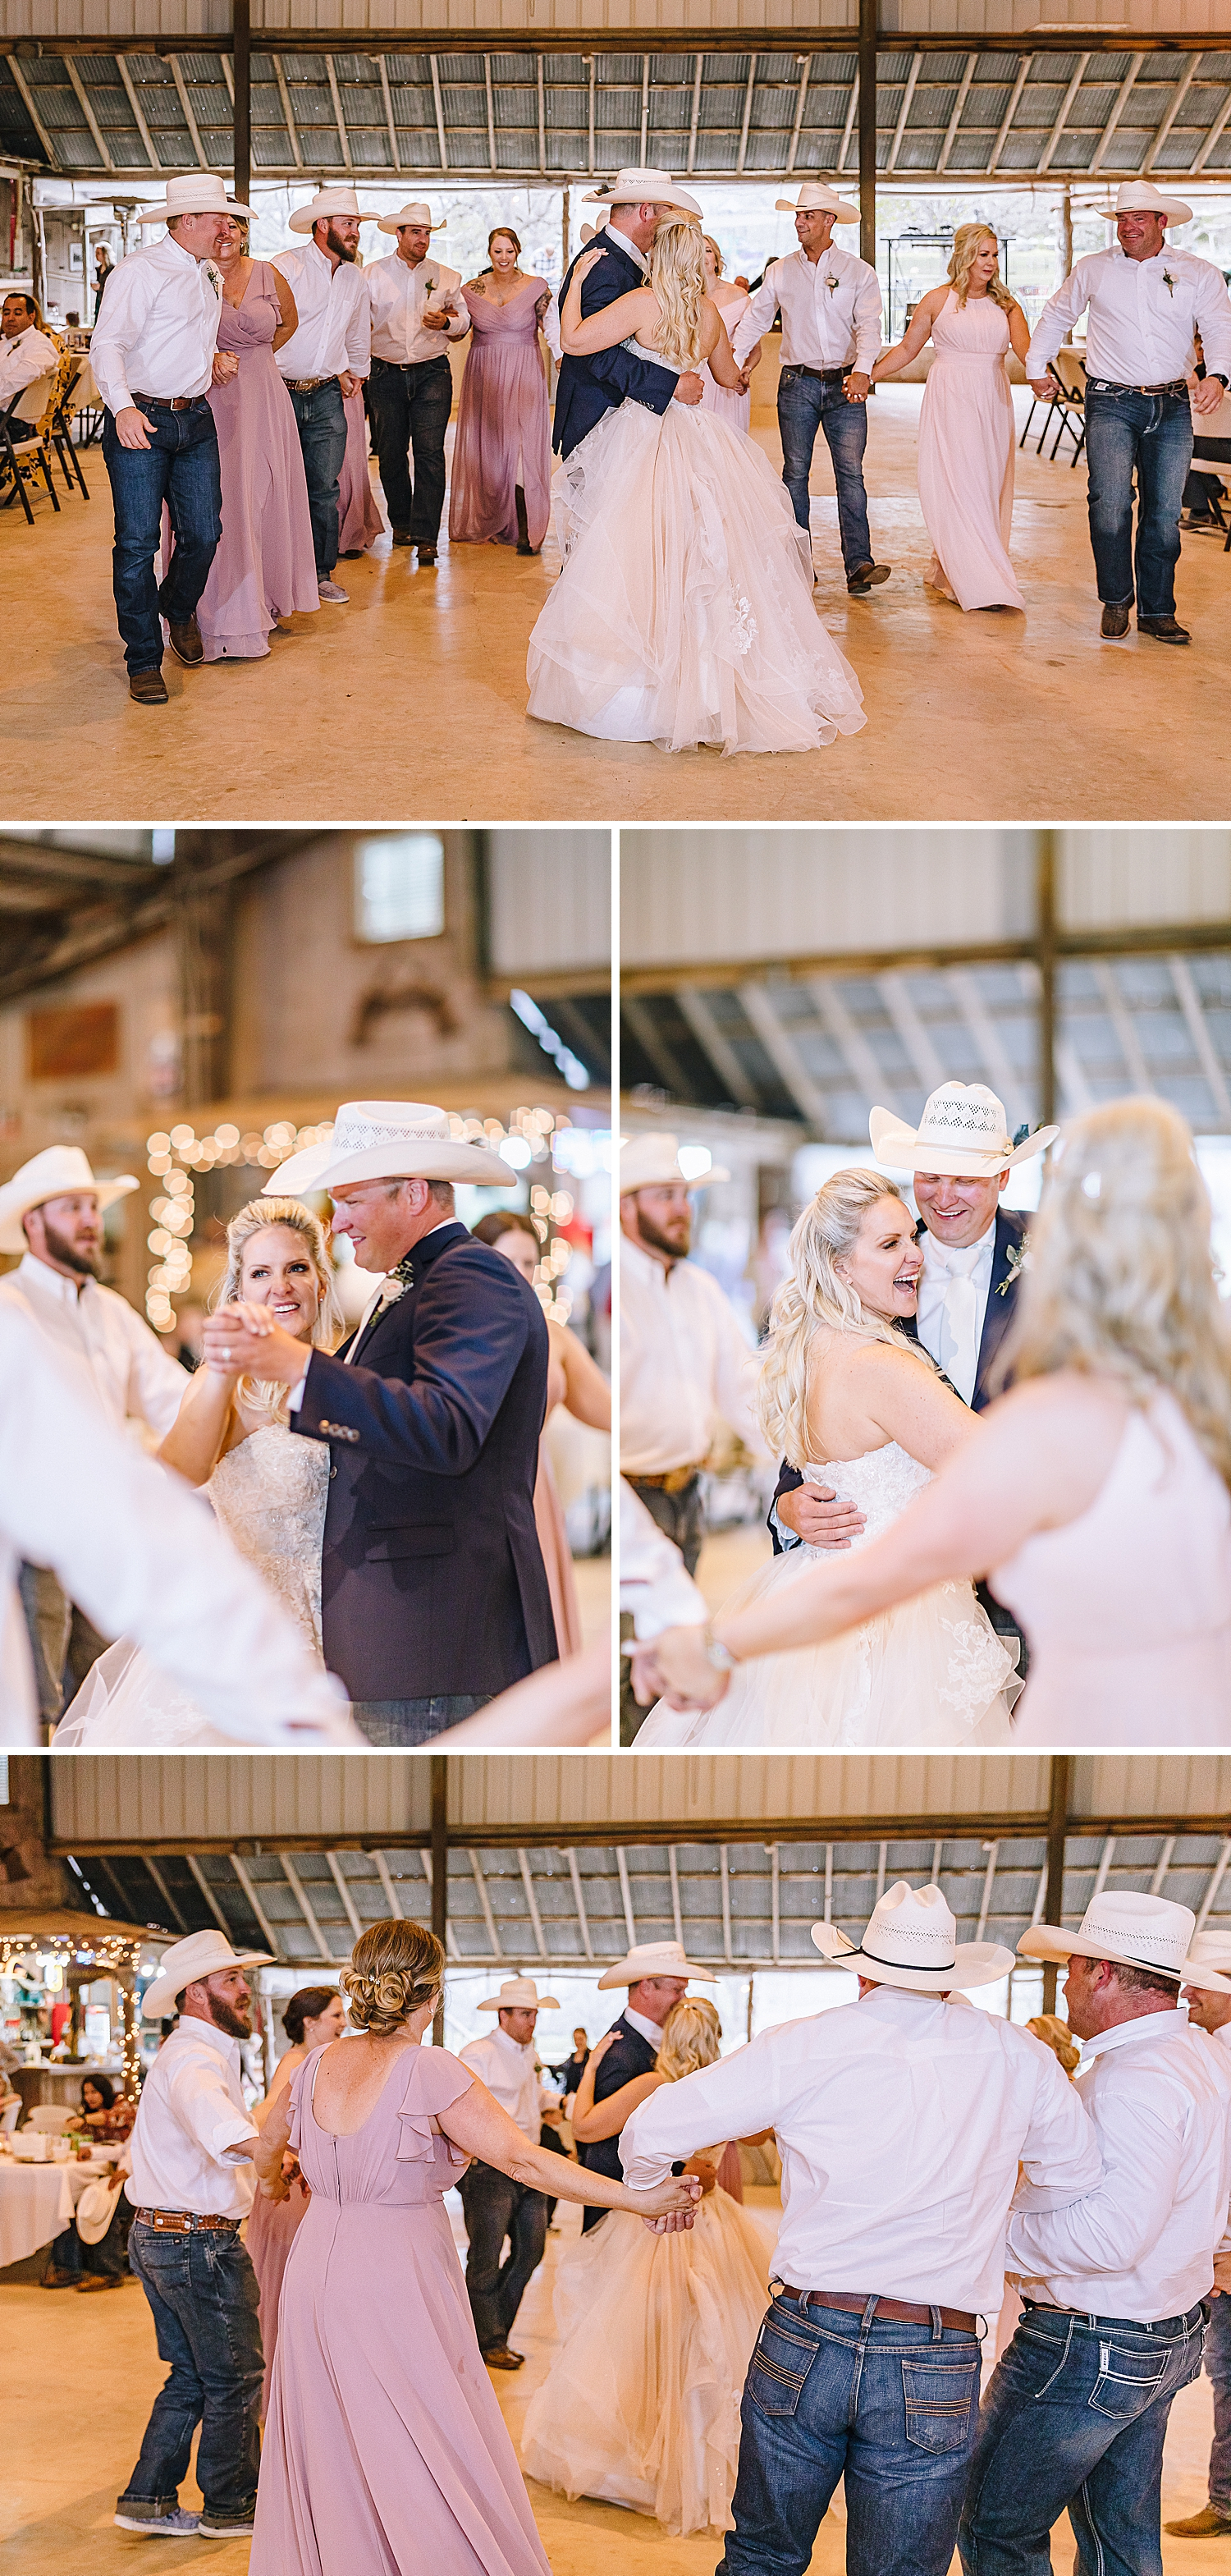 Rio-Cibilo-Ranch-Marion-Texas-Wedding-Rustic-Blush-Rose-Quartz-Details-Carly-Barton-Photography_0076.jpg